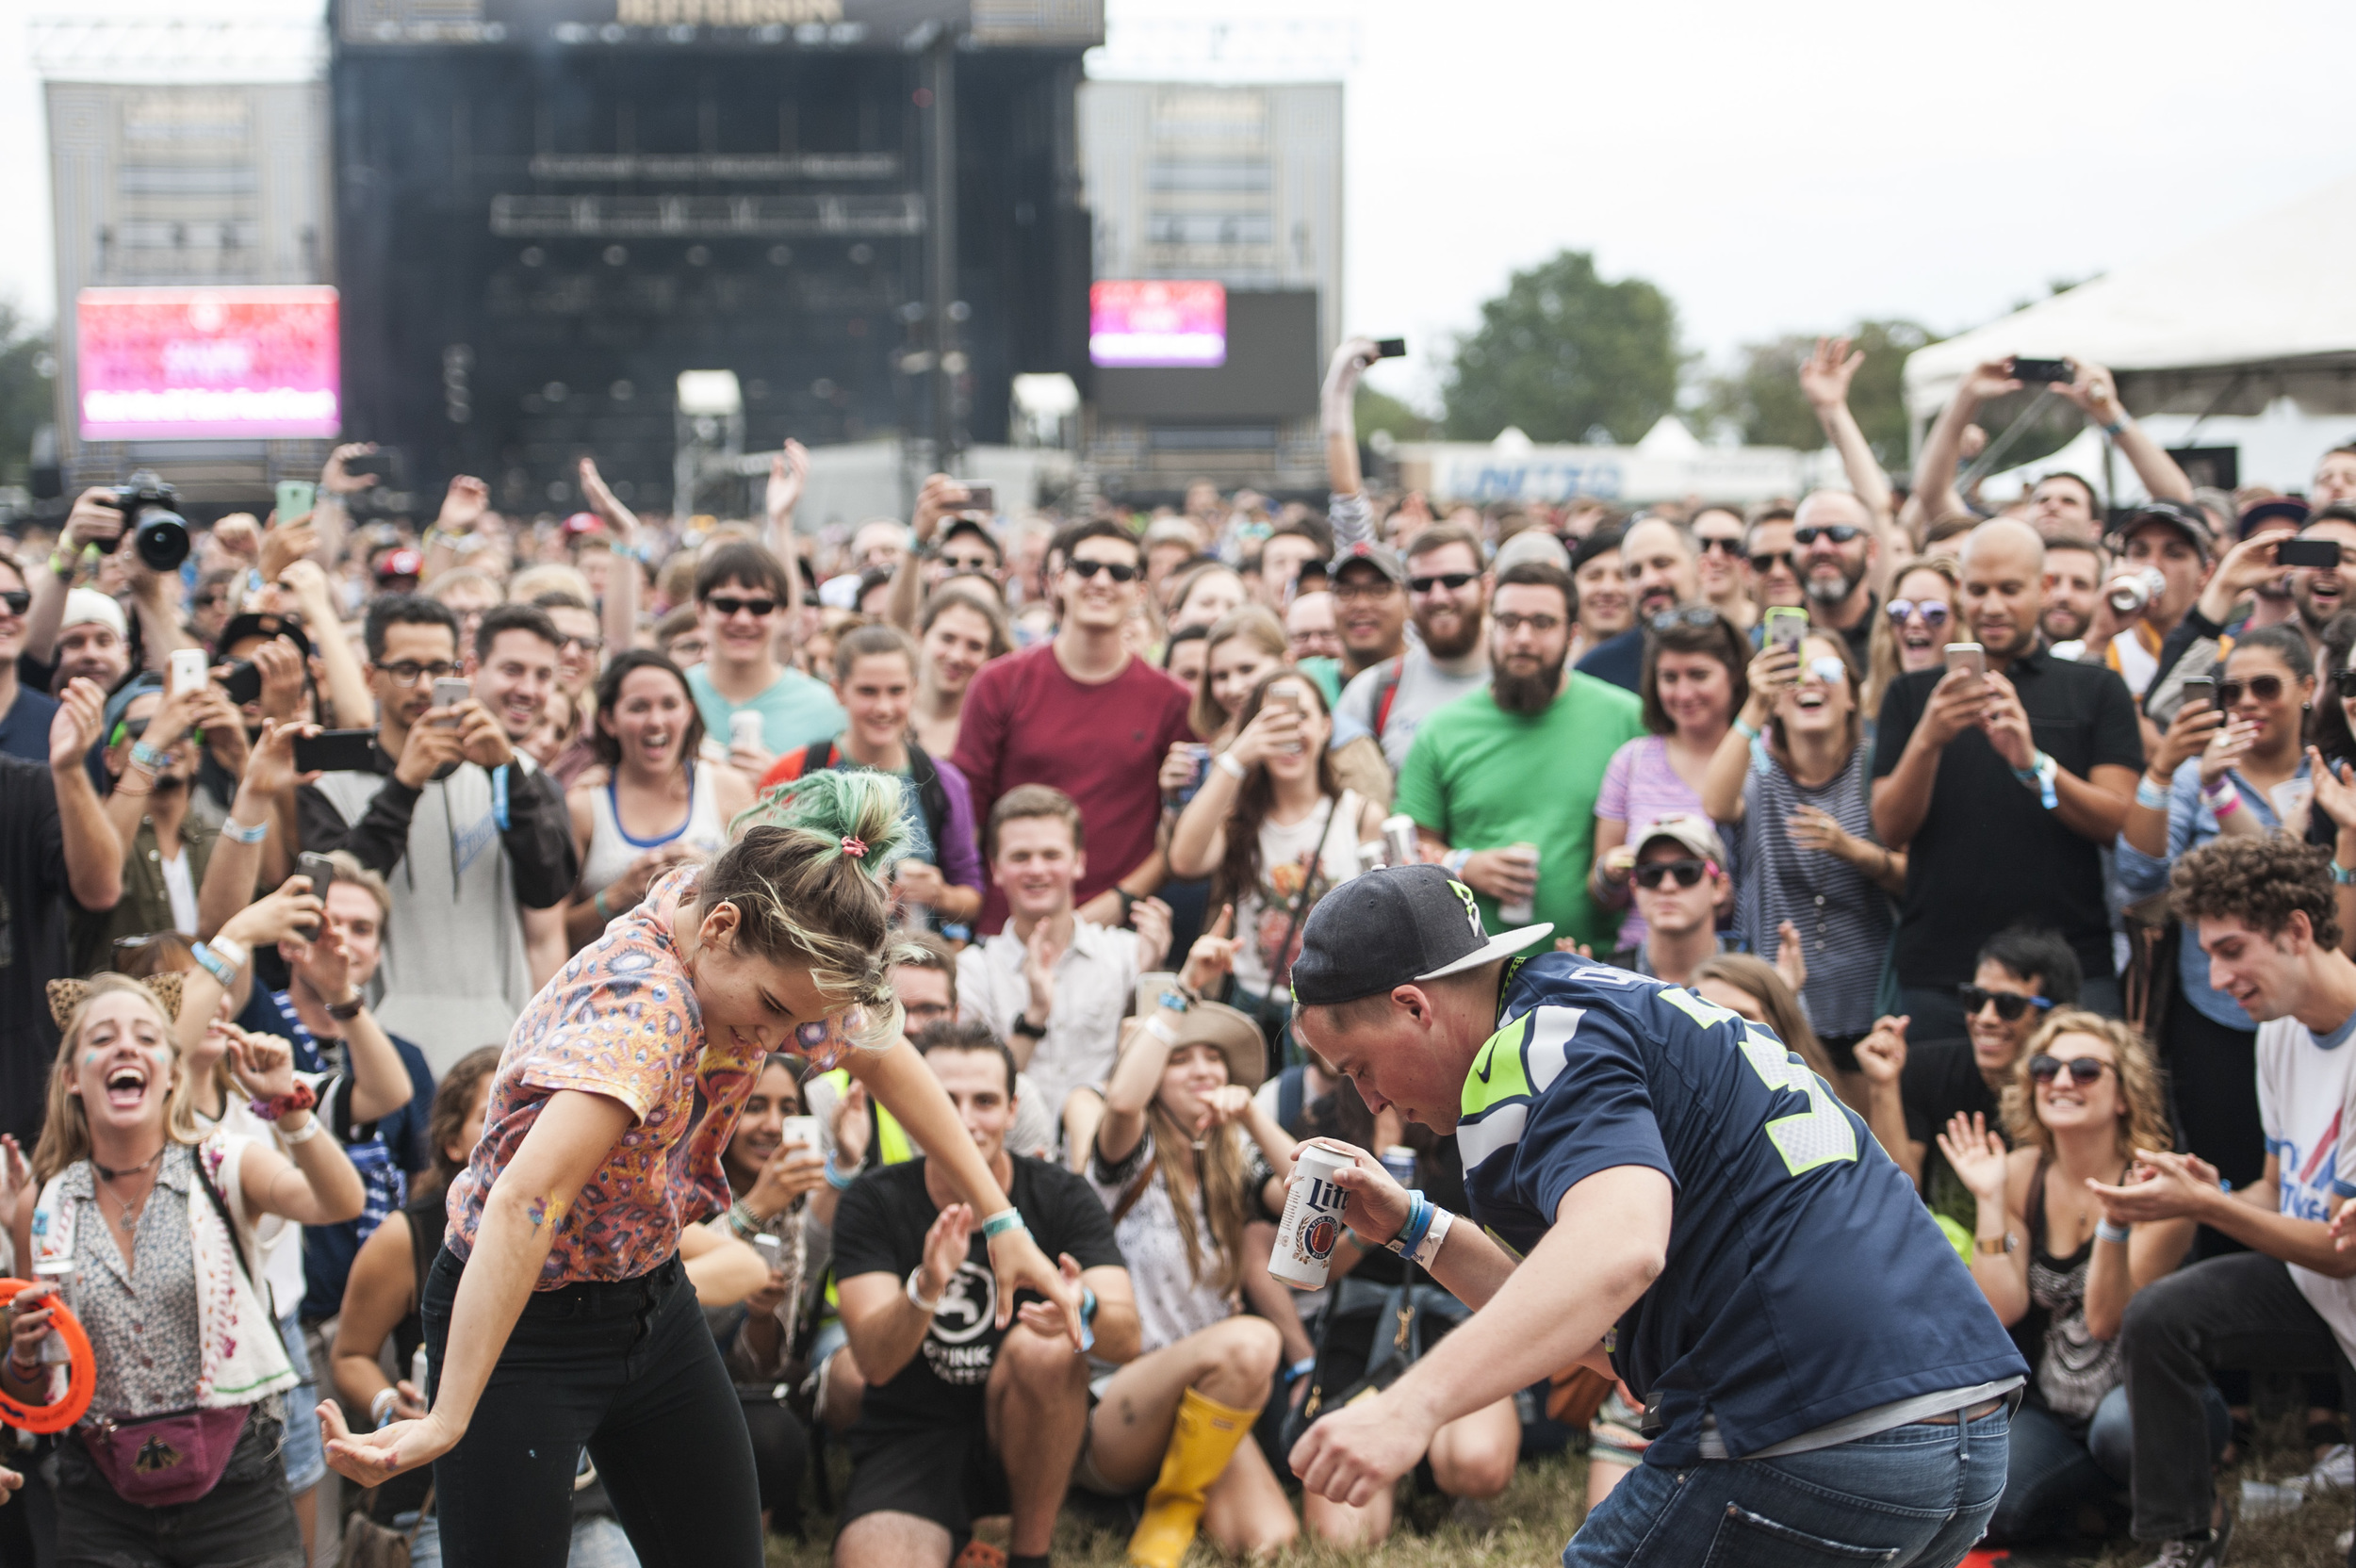 The crowd during Dan Deacon, Landmark